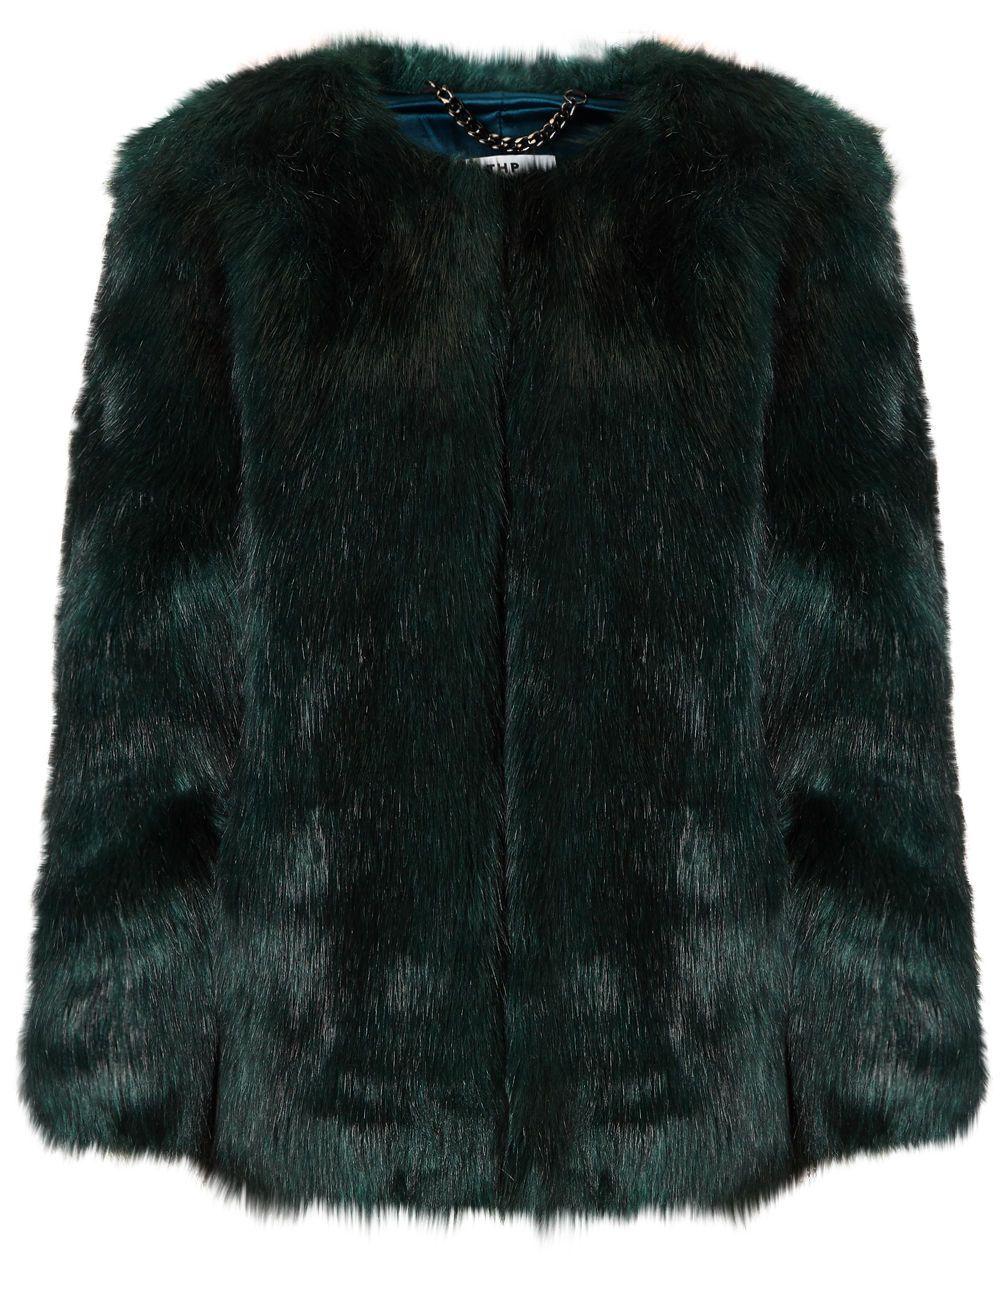 Emerald Faux Fur coat - THP Shop | Kara Style | Pinterest | Coats ...